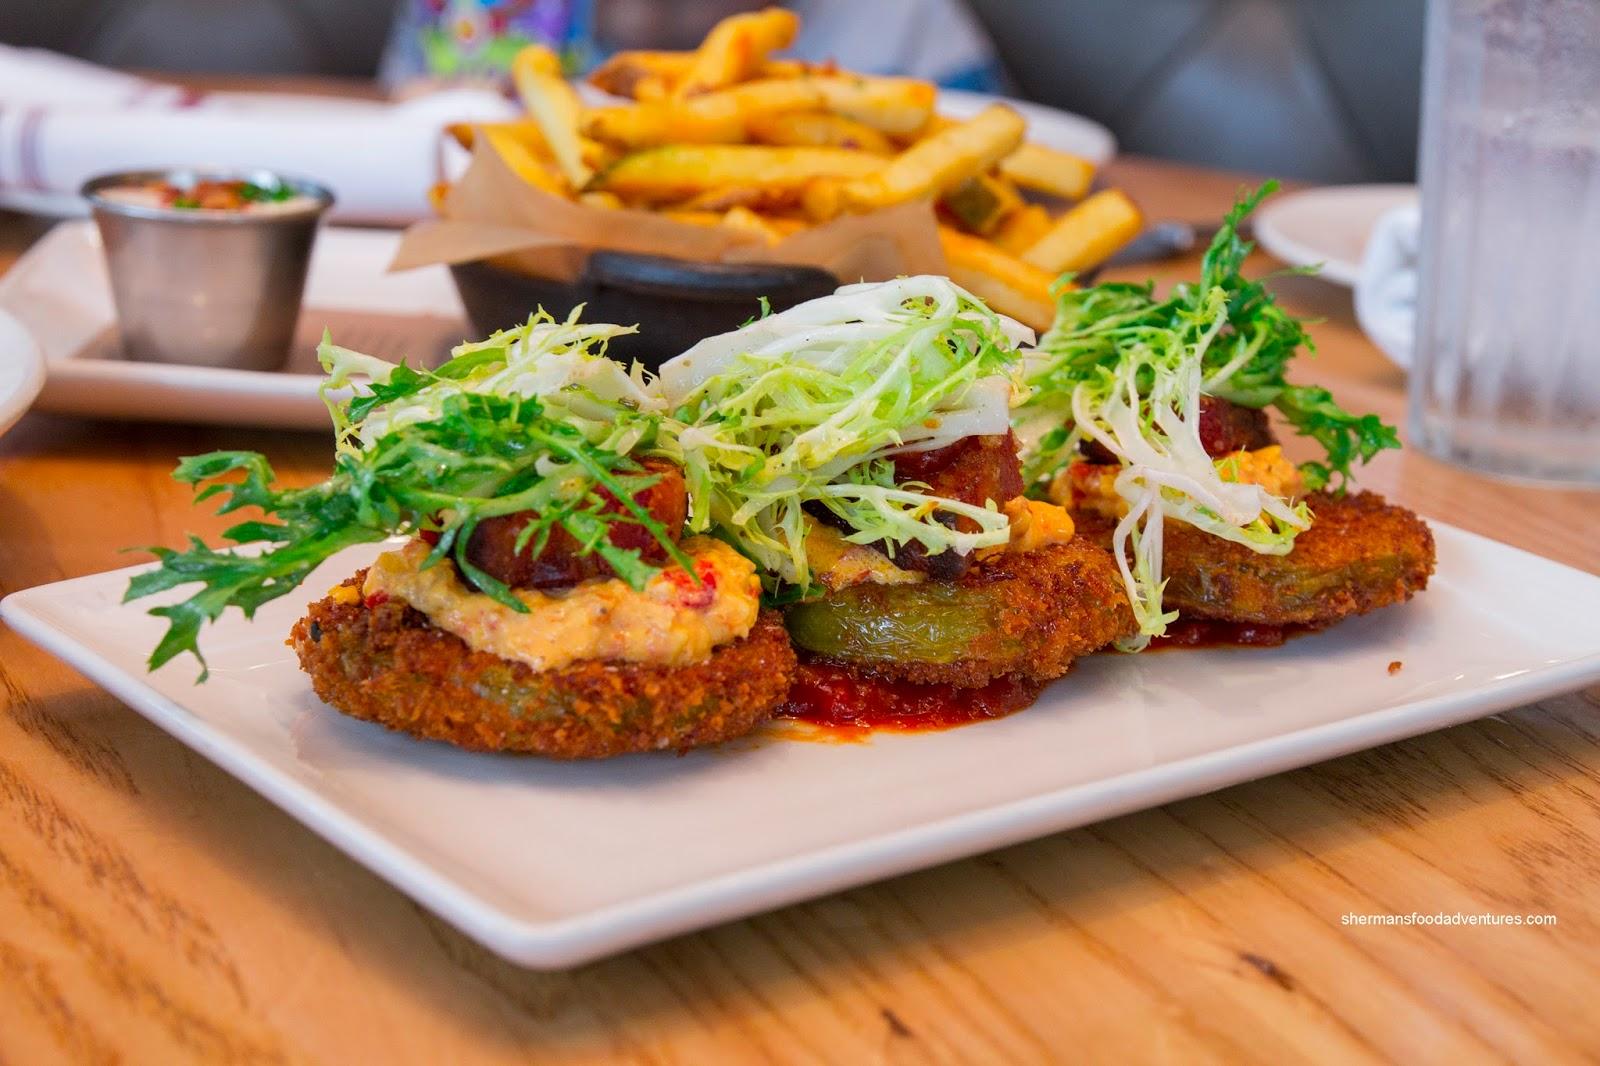 Sherman's Food Adventures: Yardbird Southern Table & Bar